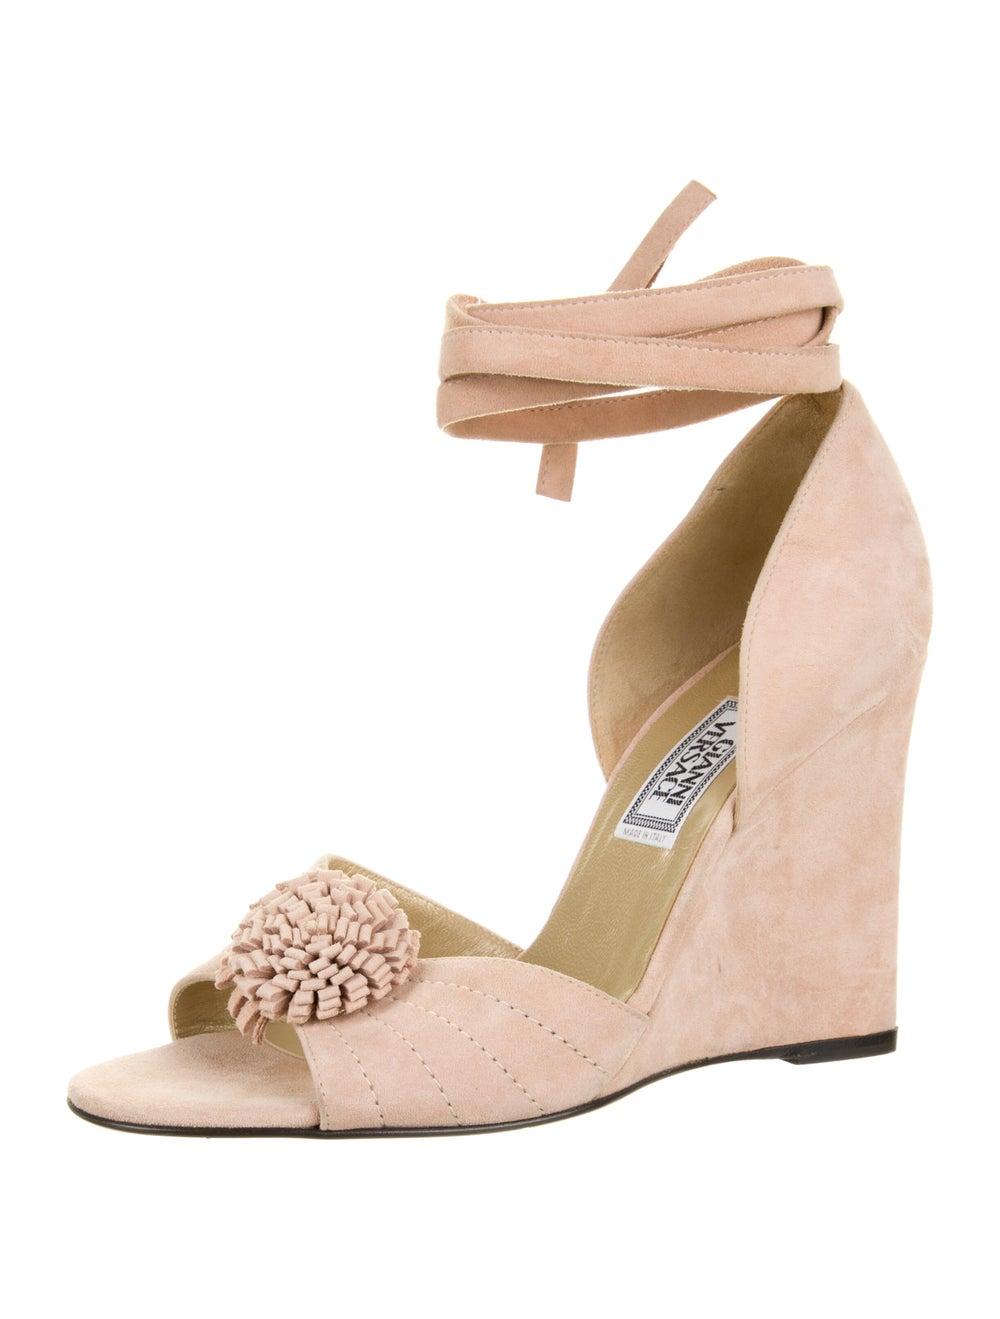 Gianni Versace Vintage Suede Sandals - image 2